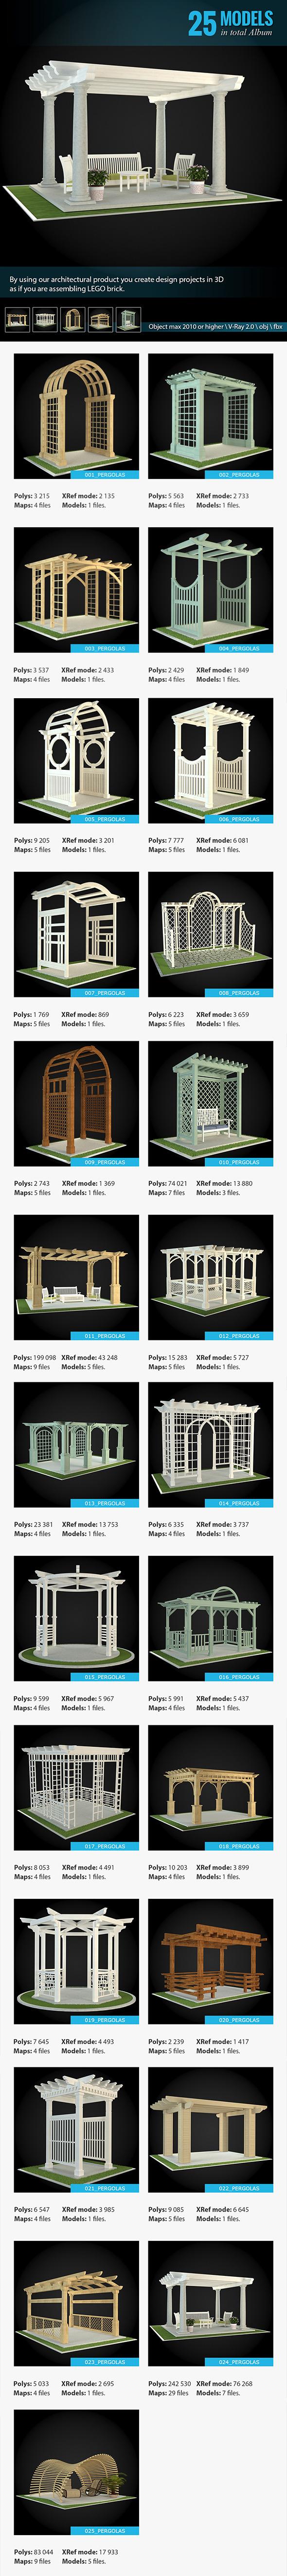 Pergolas Collection - 3DOcean Item for Sale